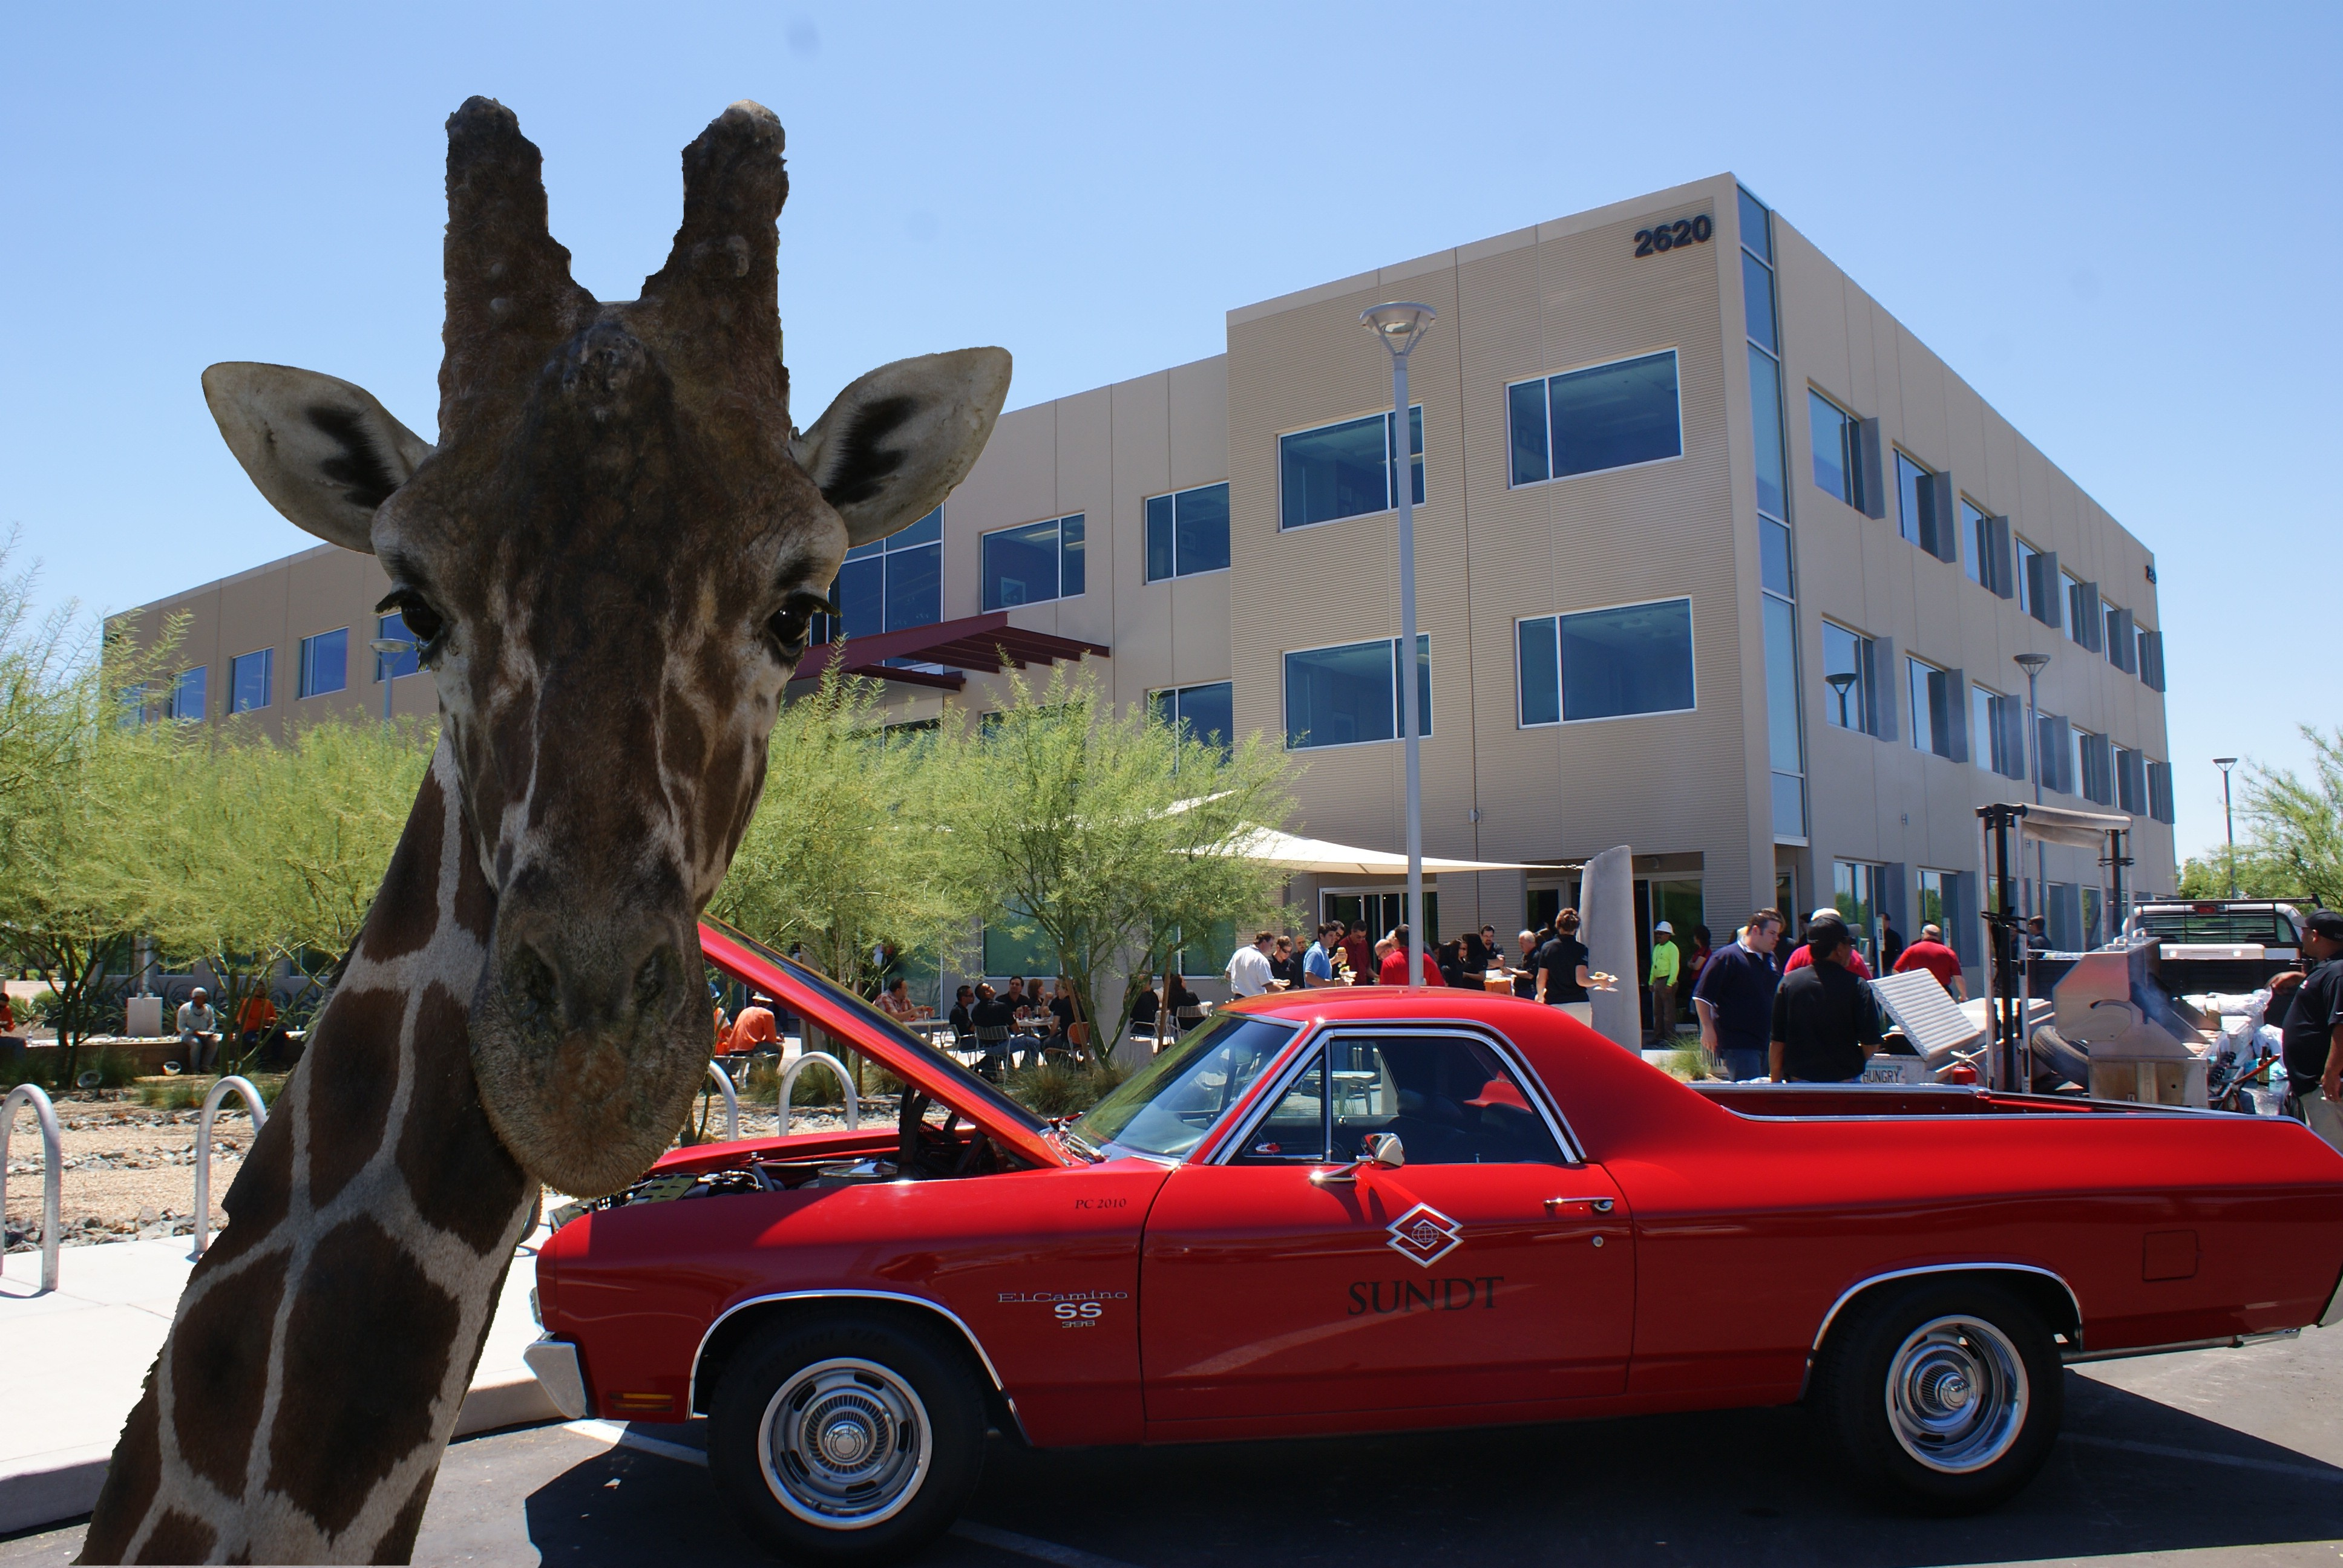 Giraffe at Sundt